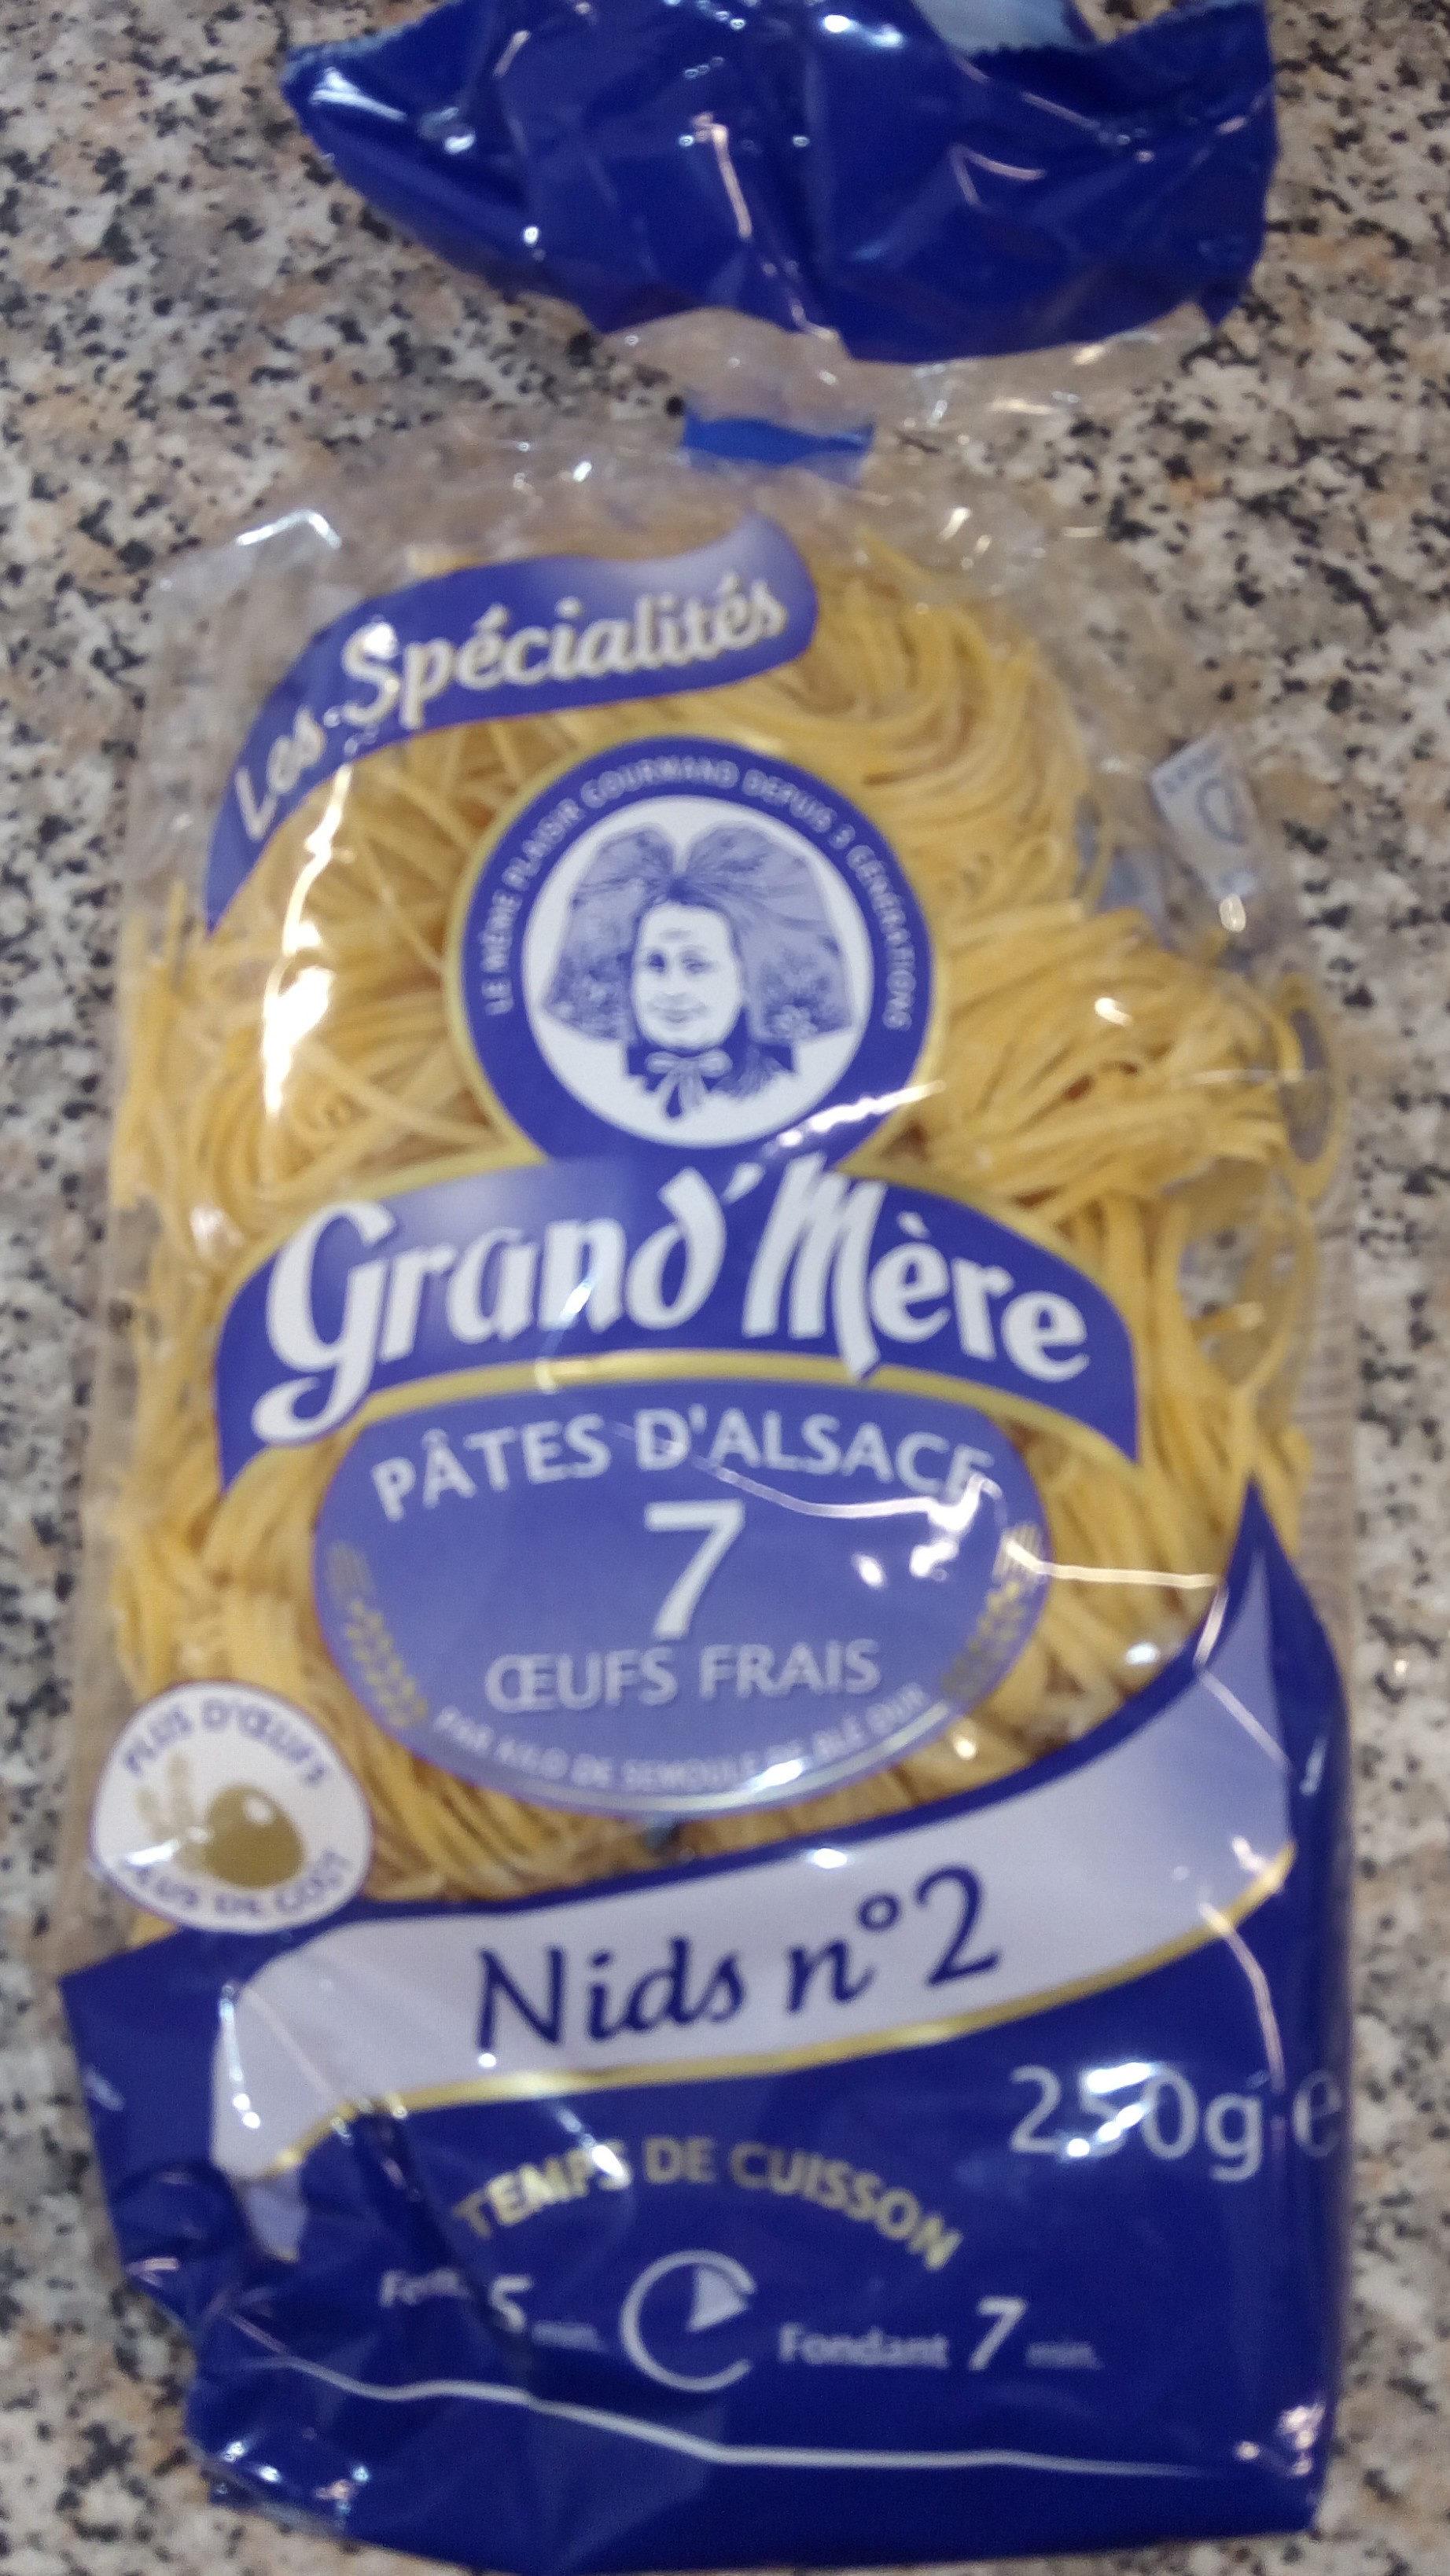 Pâtes d'alsace  Nids n° 2 - 製品 - fr